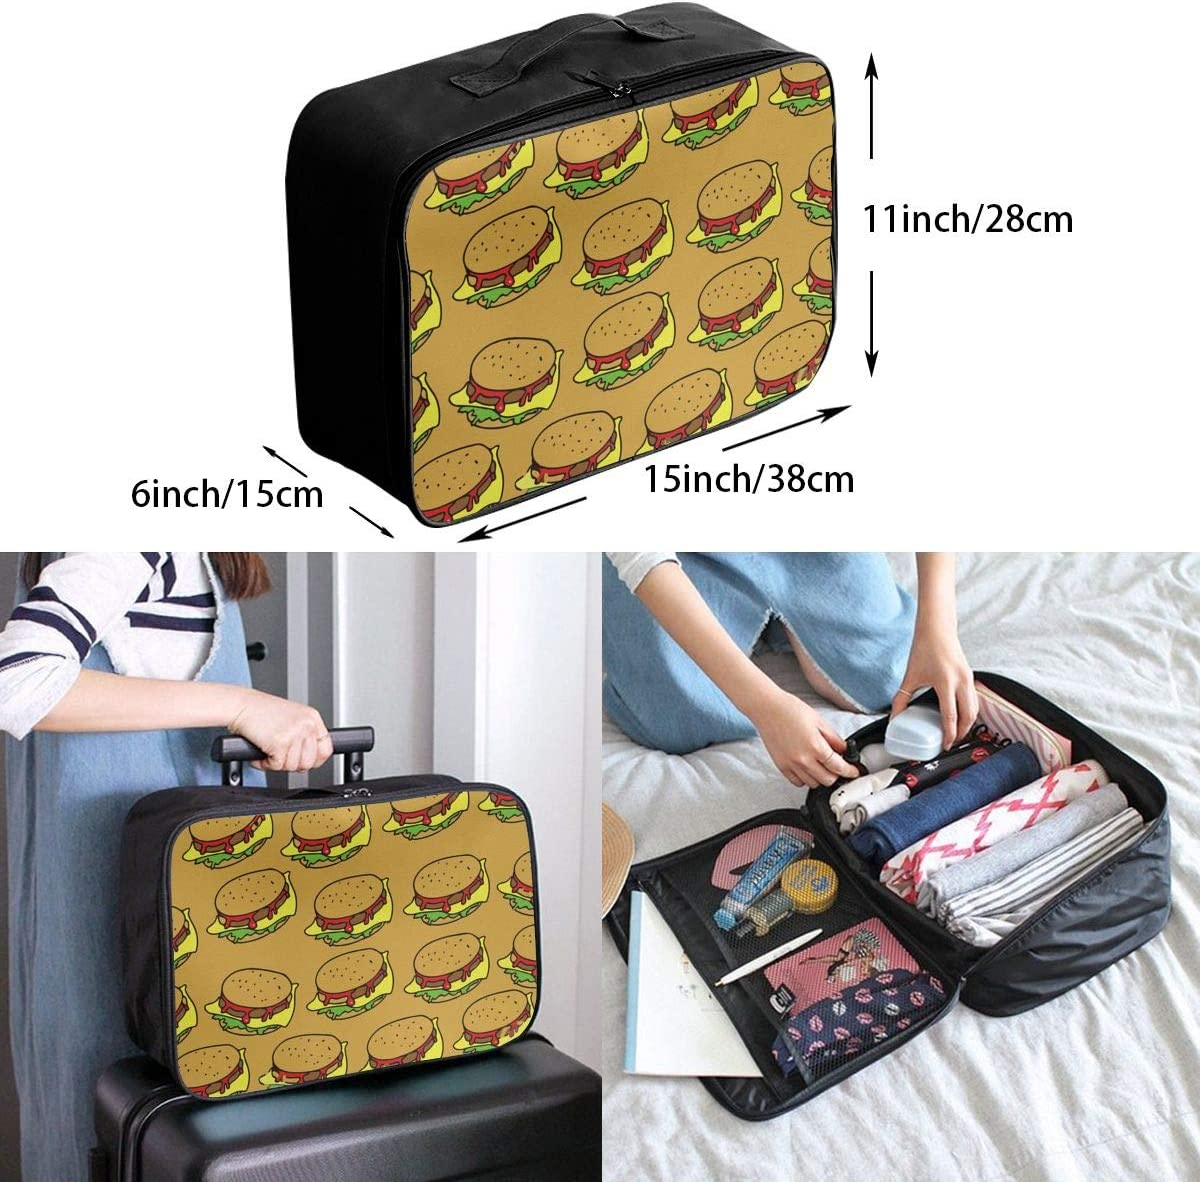 JTRVW Luggage Bags for Travel Dala Horses Upgraded Travel Duffel Bag Waterproof Fashion Lightweight Large Capacity Portable Duffel Bag for Men /& Women